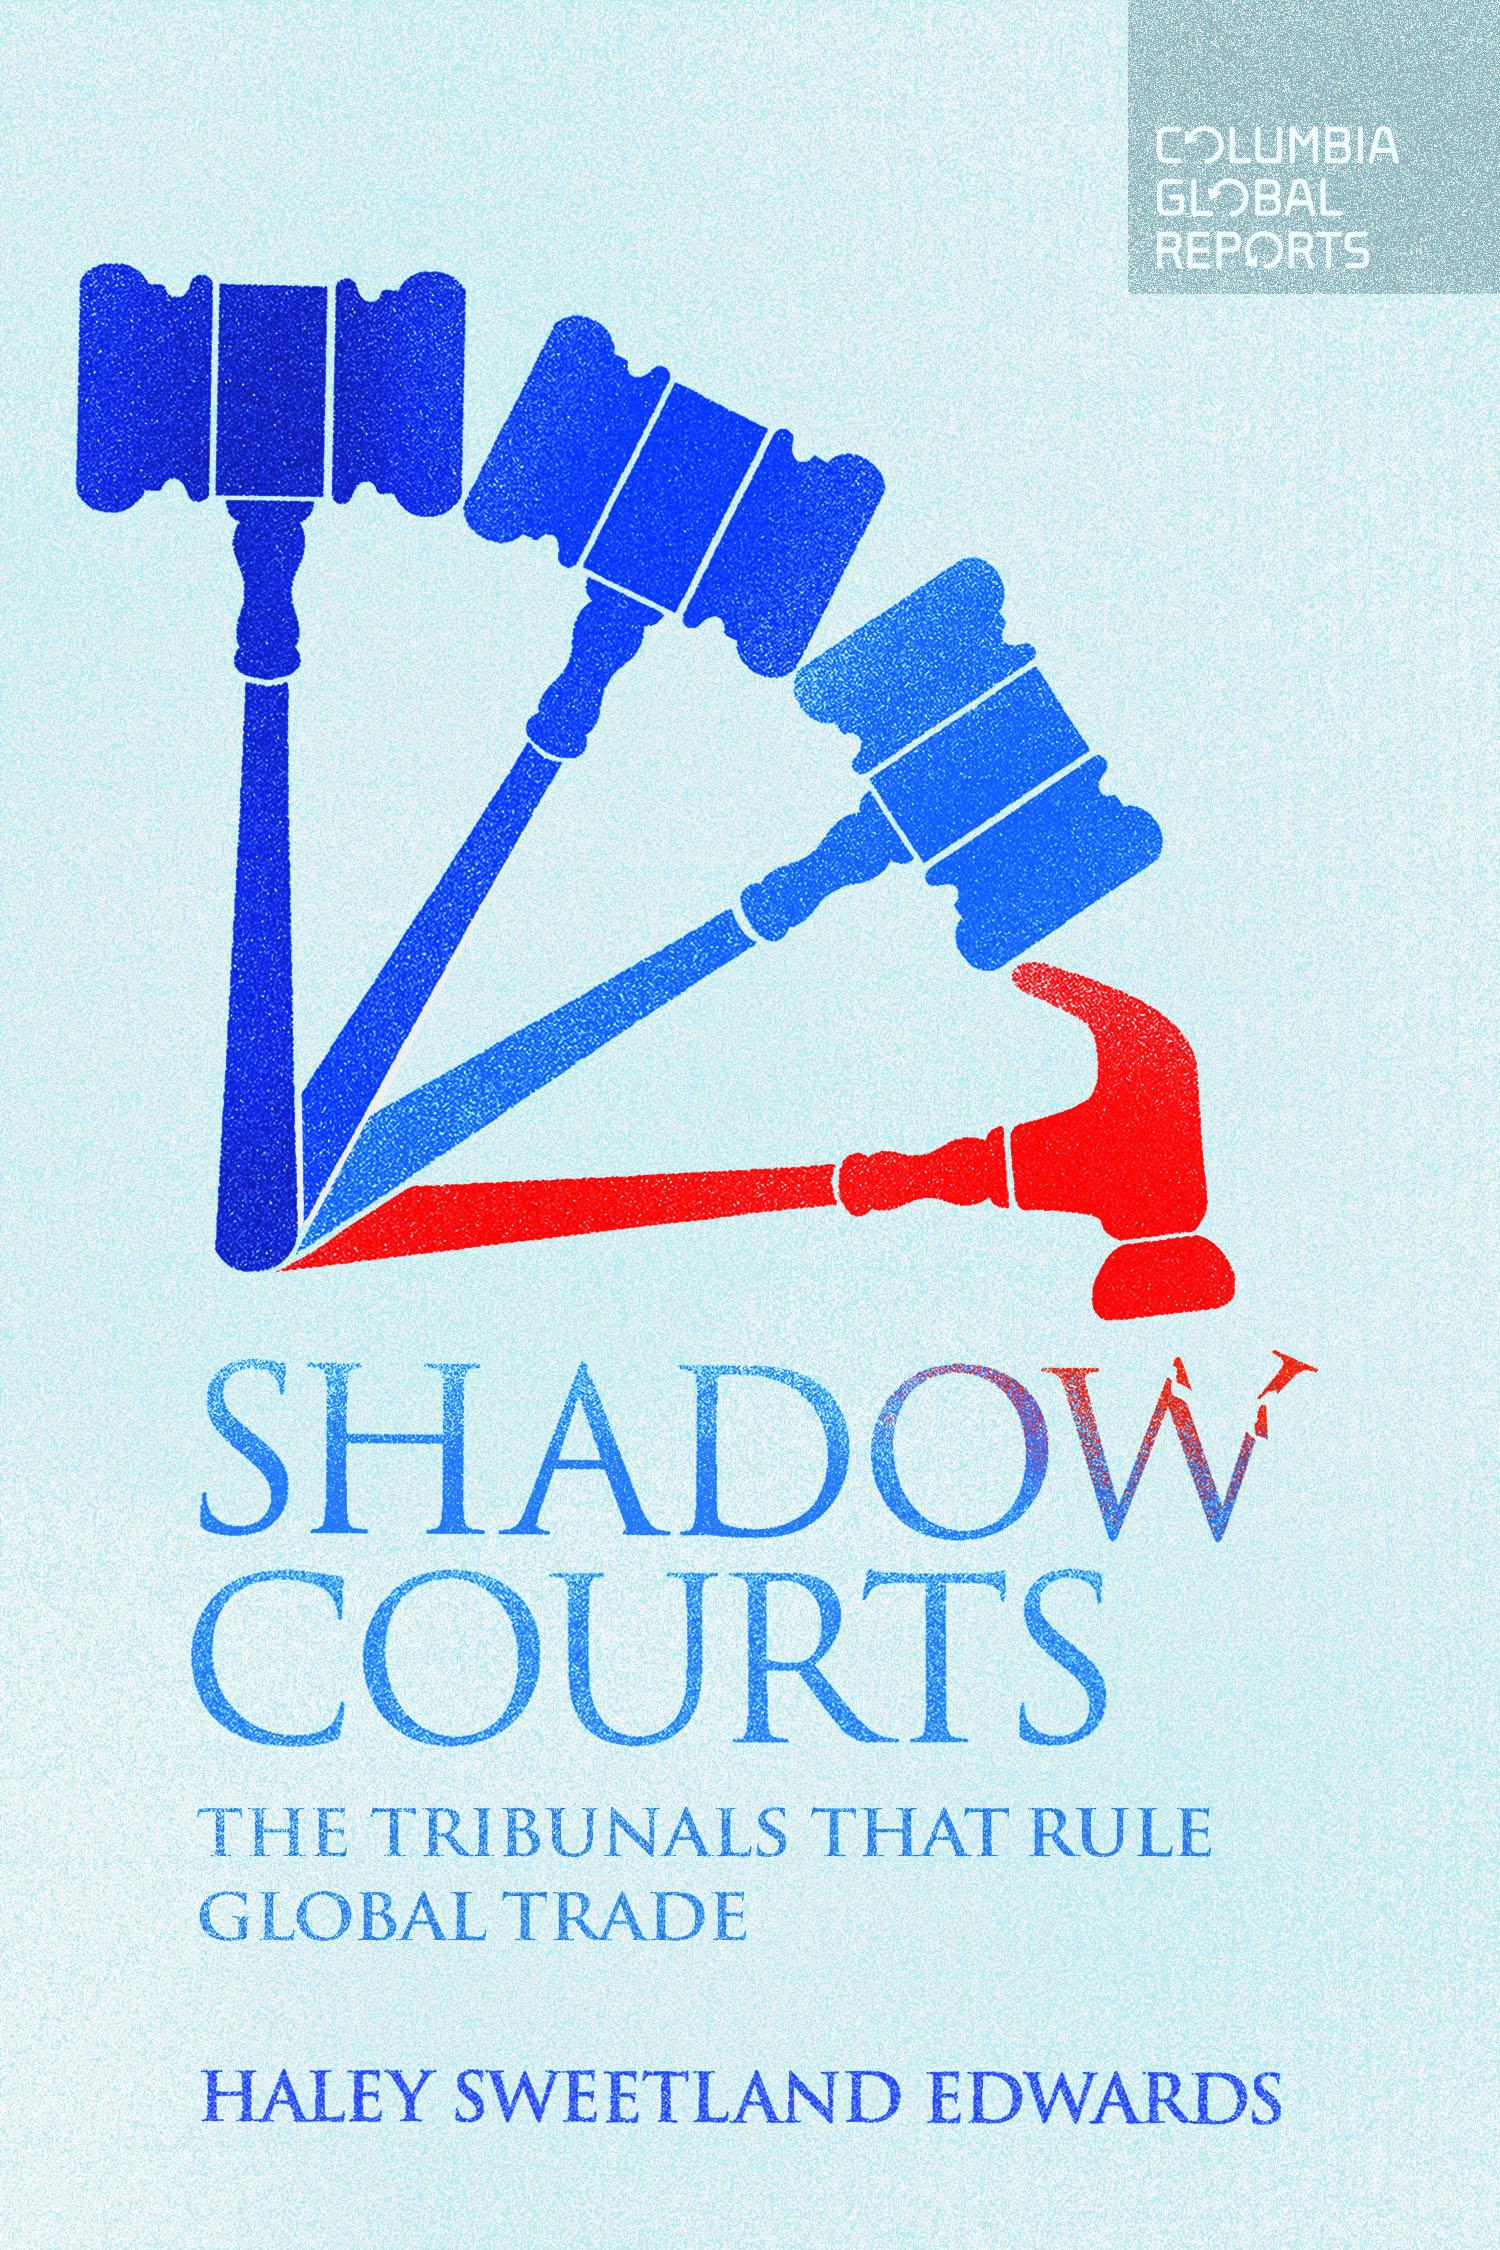 ShadowCourts